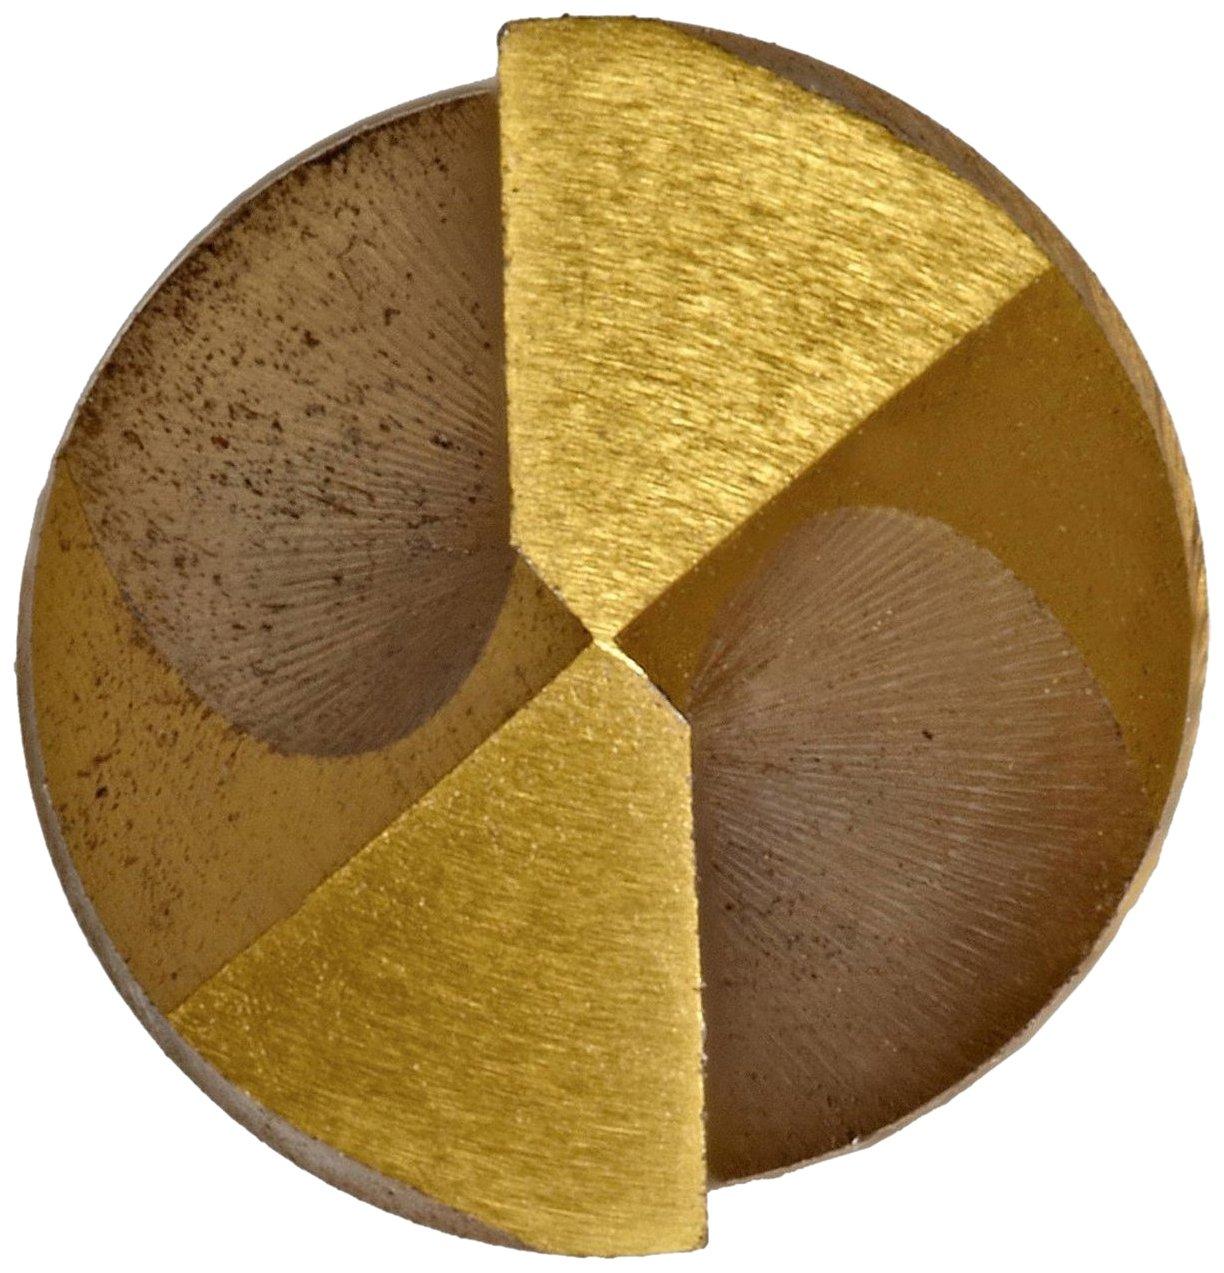 49//128 Diameter x 5-1//8 Length Straight Shank 135 Degree YG-1 D2GP High Speed Steel Gold-P Jobber Drill Bit TiN Finish W Size Slow Spiral Pack of 5